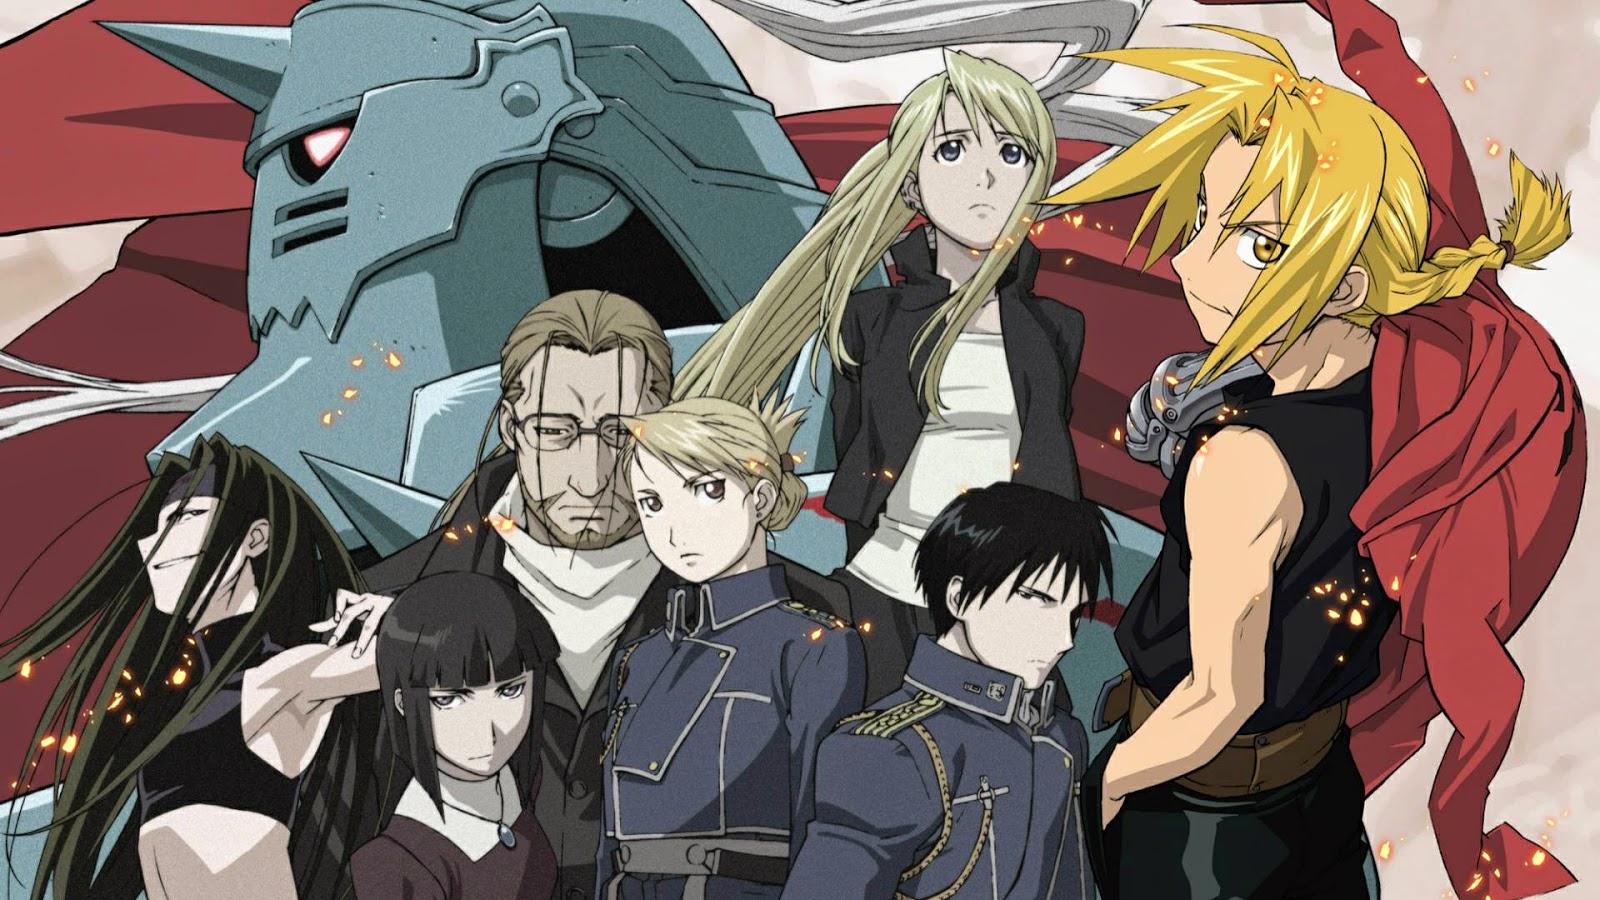 Fullmetal Alchemist (2003) vs. Fullmetal Alchemist ...